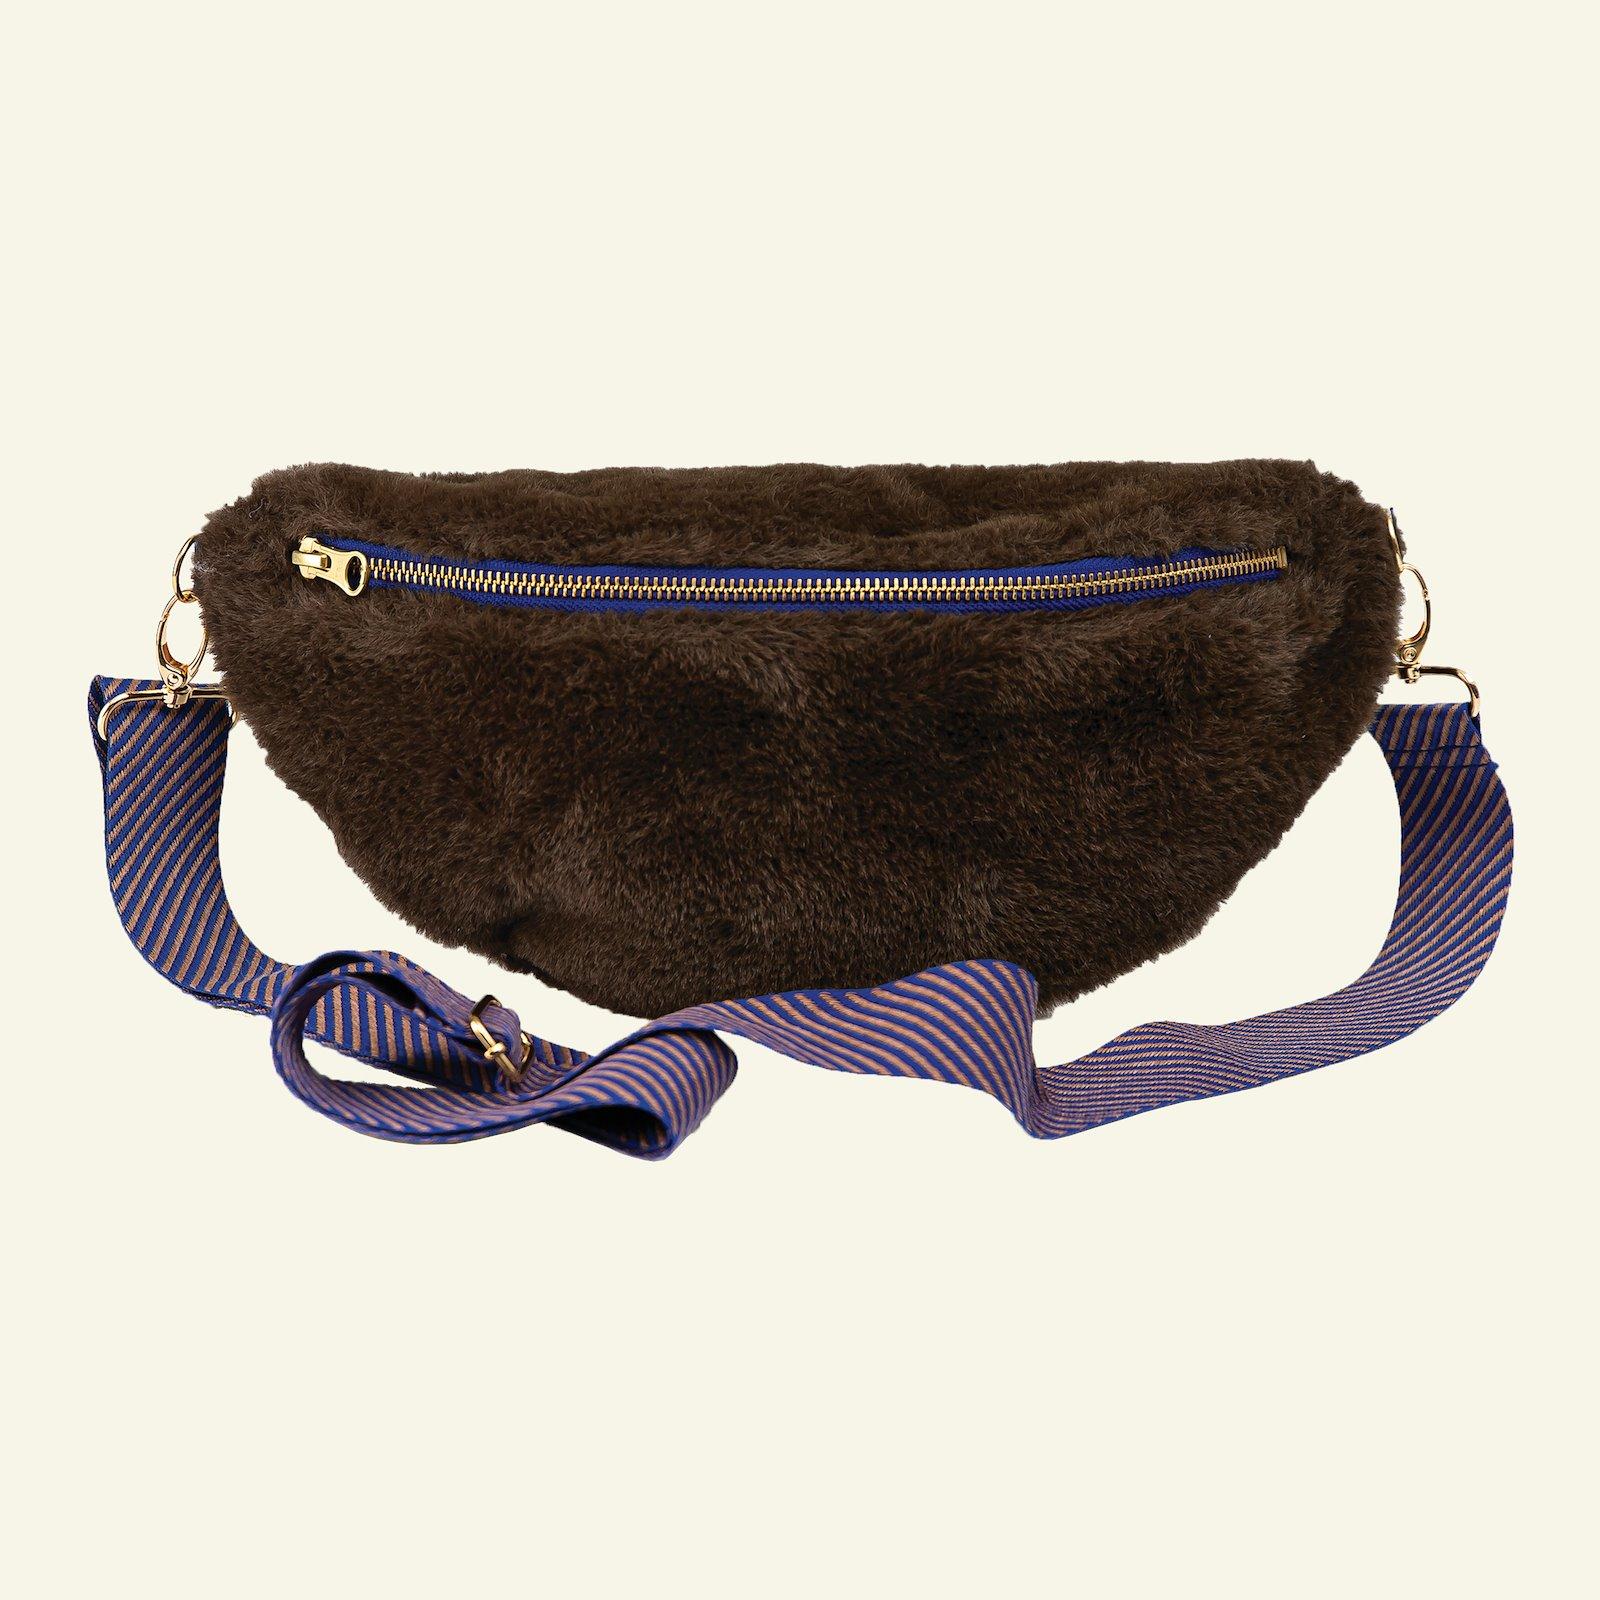 Boxy bum bag p90330_910187_21451_sskit